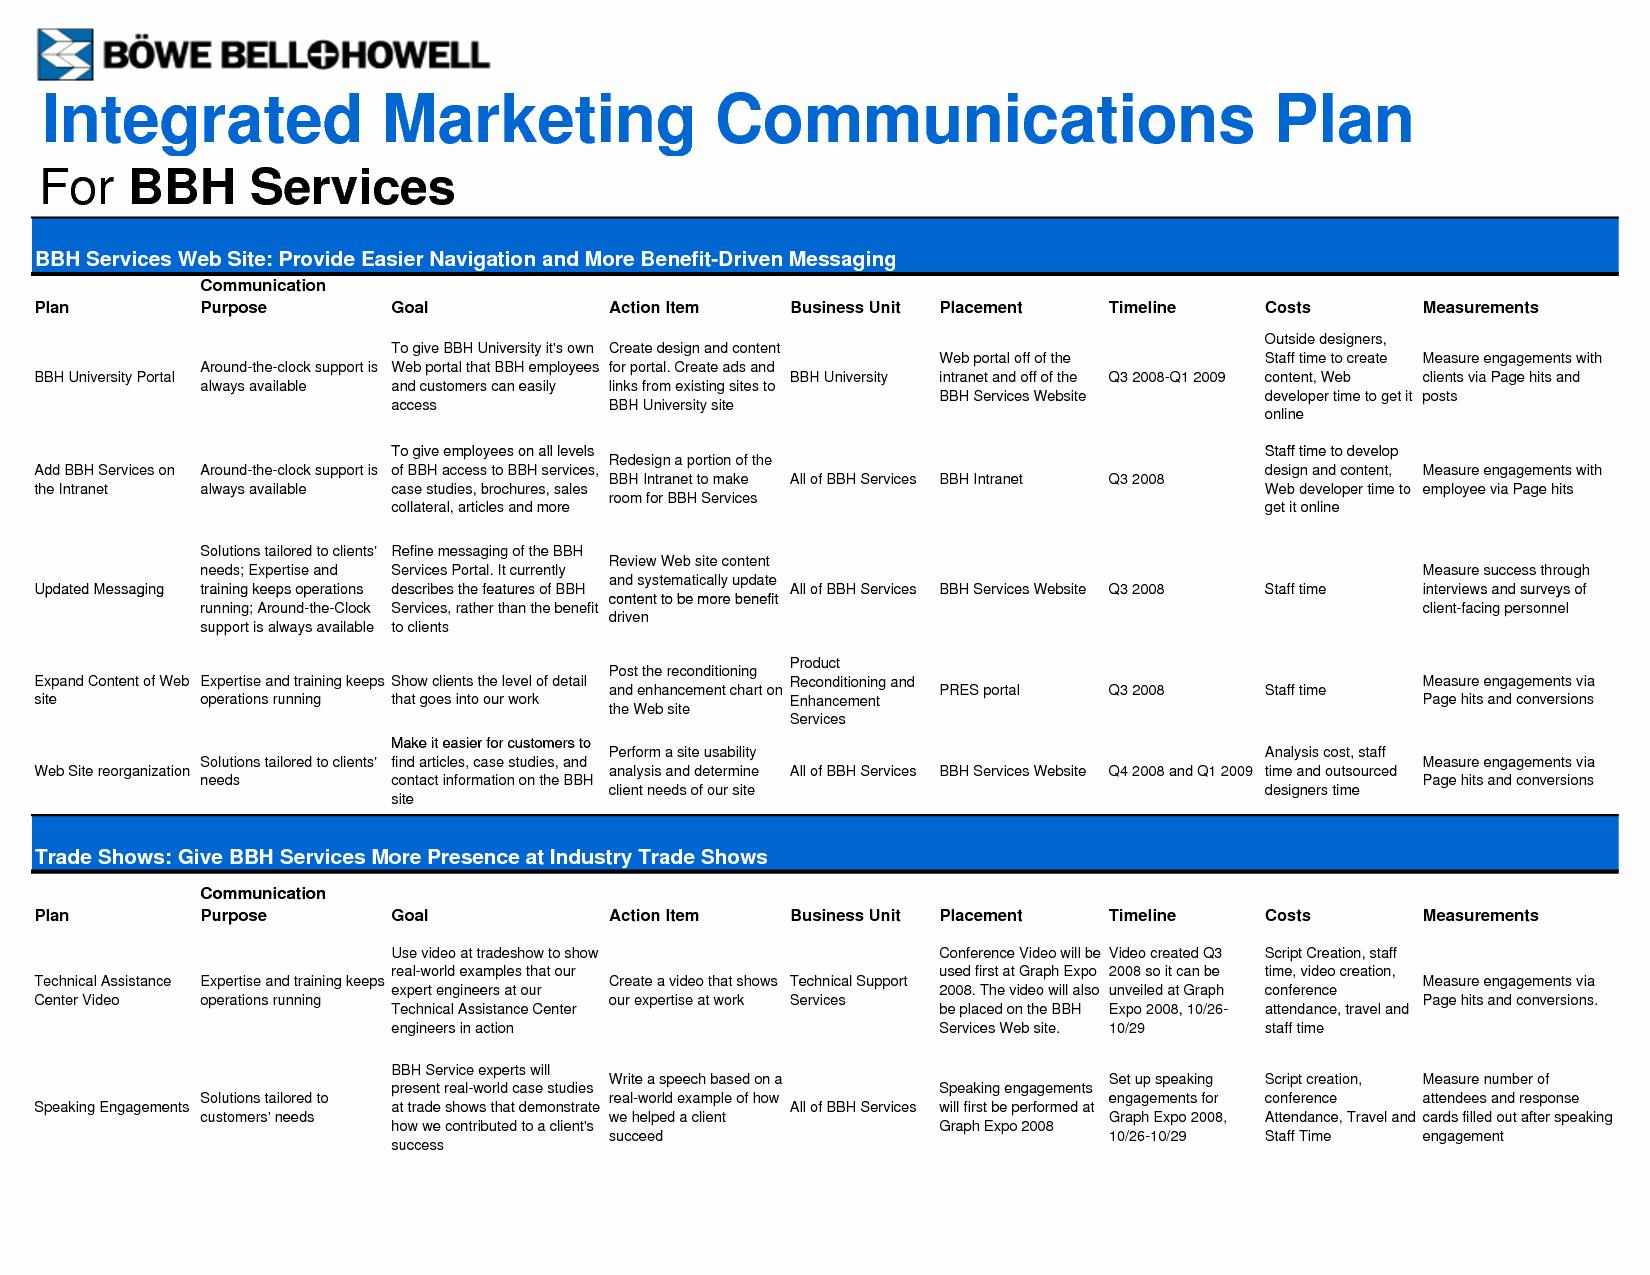 Marketing Communications Plan Template Unique Marketing Plan Template Google Search